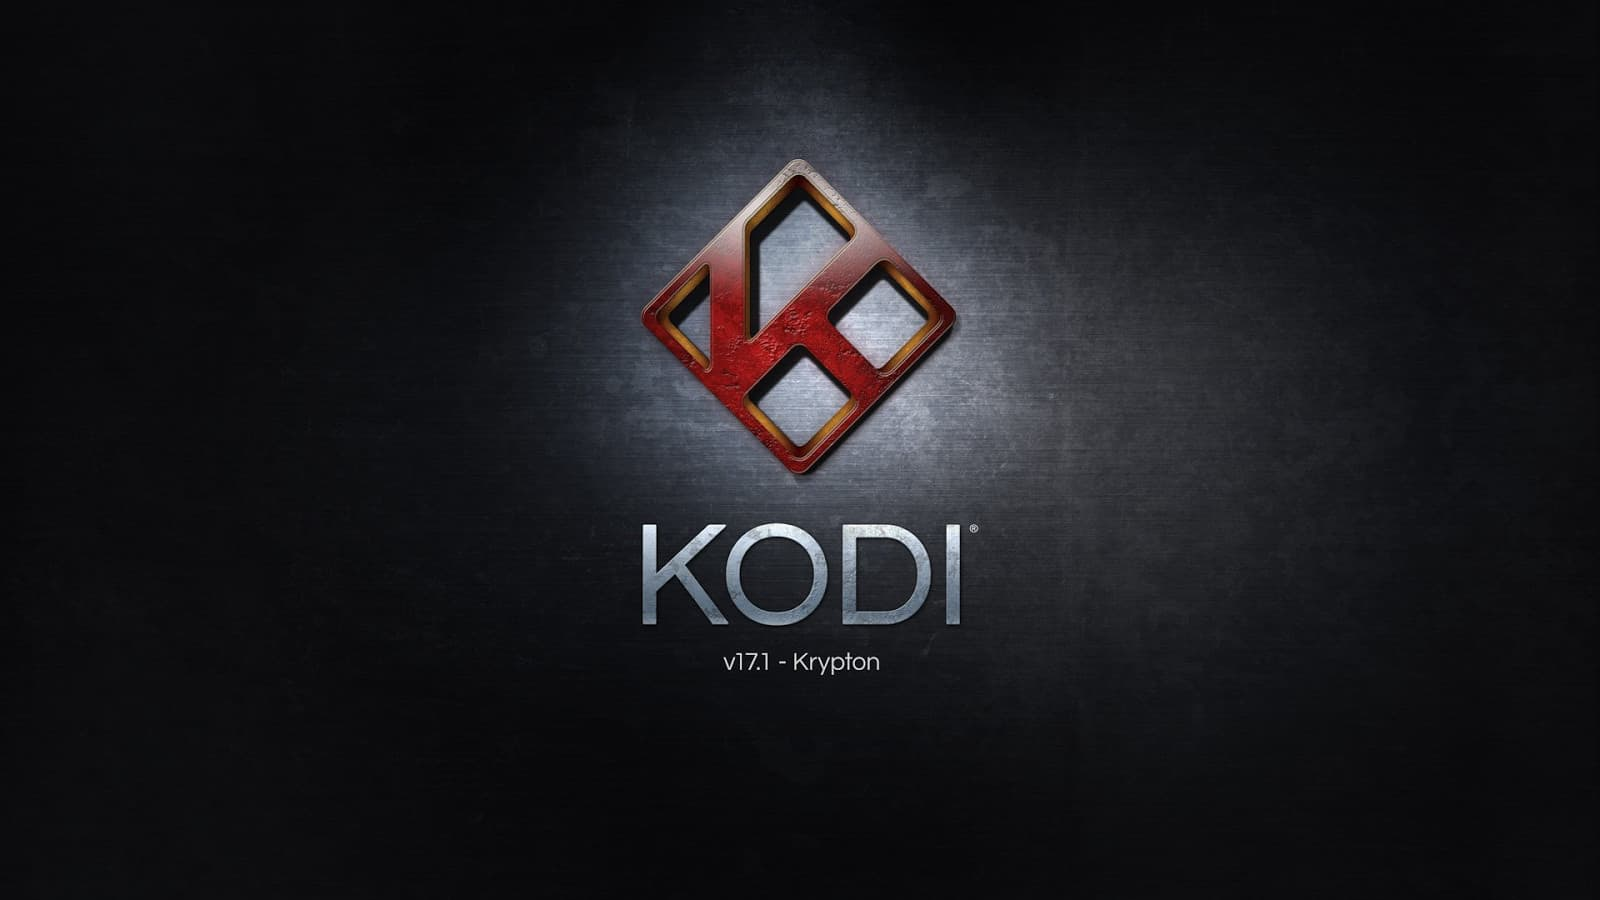 How to Uninstall a Kodi Build on Amazon Fire Stick or FireTV